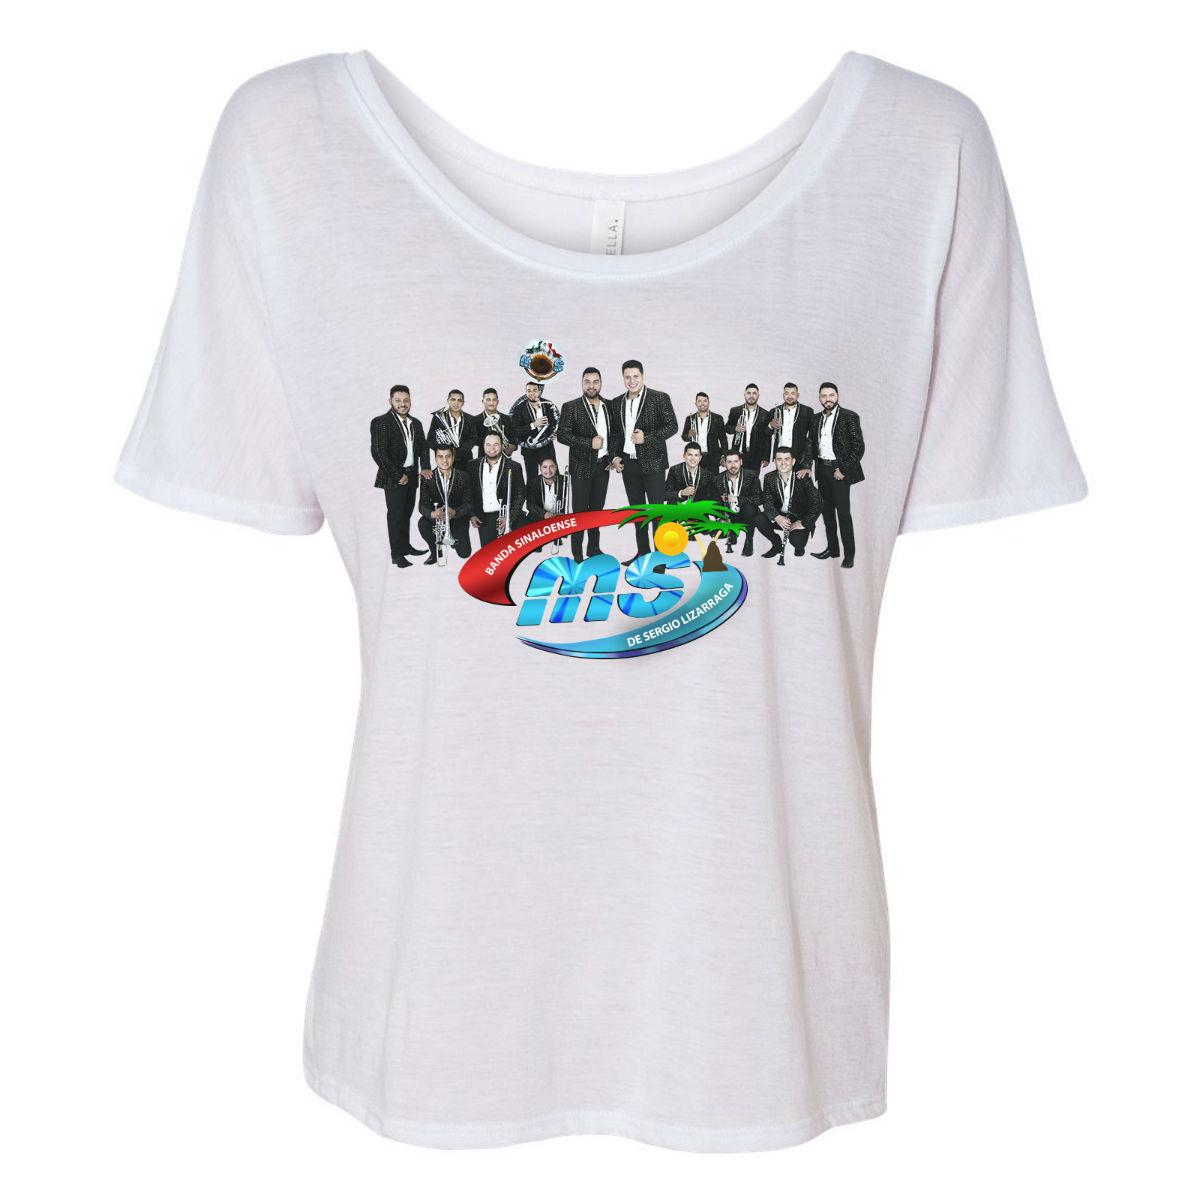 Women's Flowy Photo T-Shirt